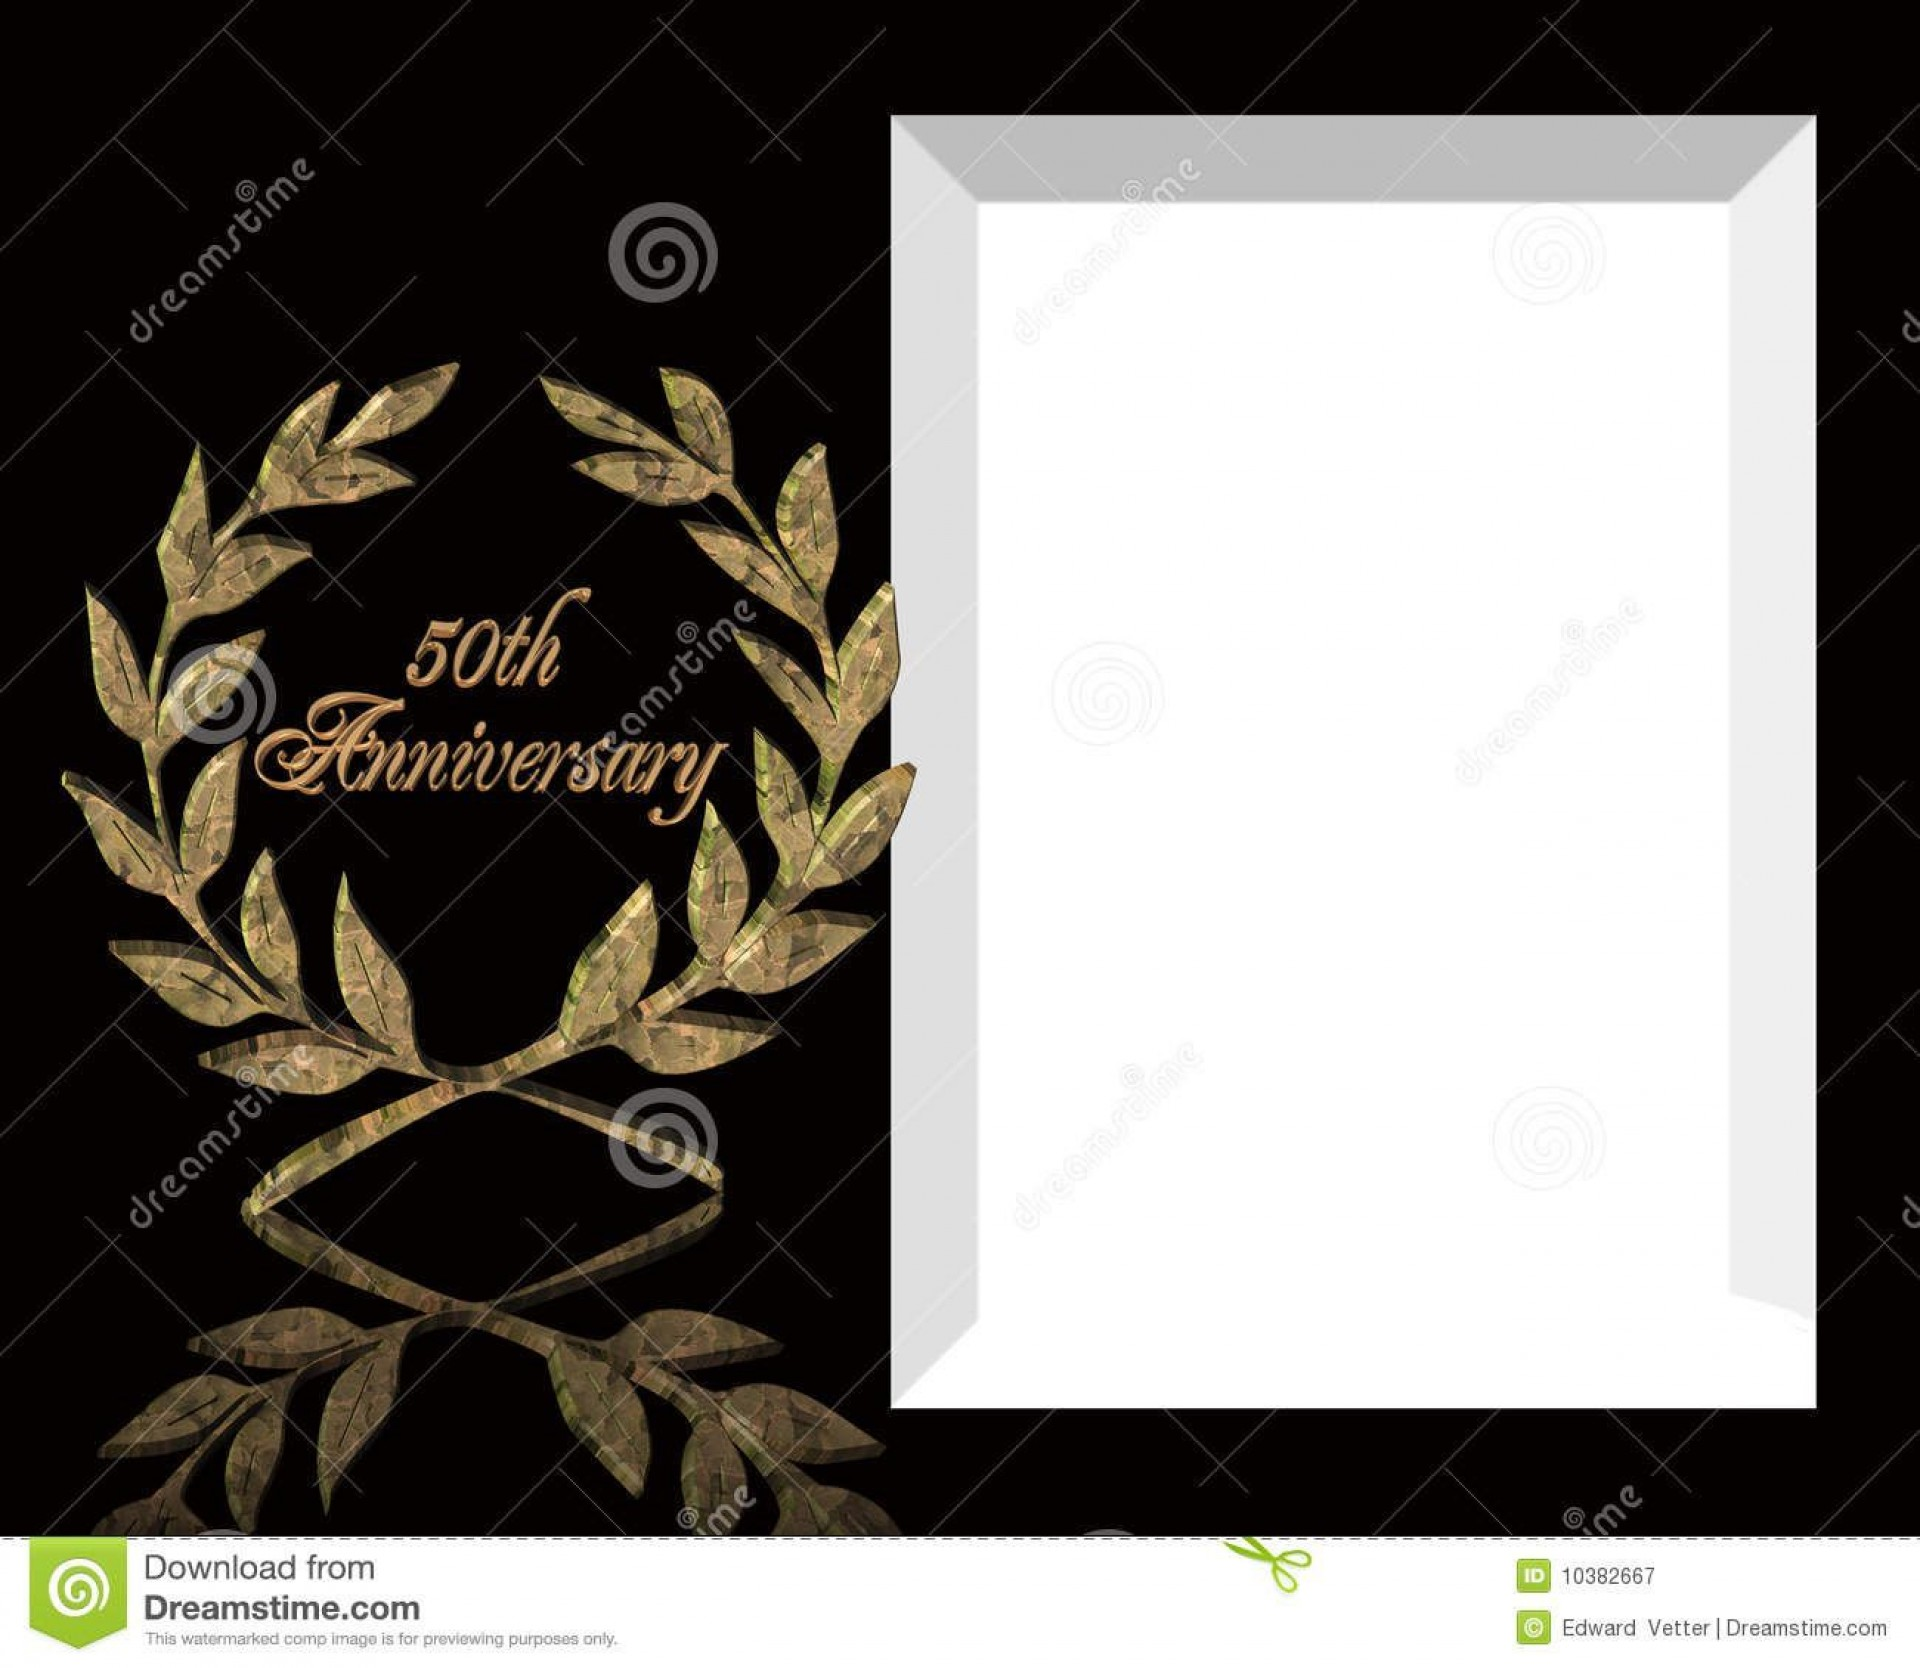 005 Wondrou 50th Anniversary Invitation Template Free Download Image  Golden Wedding1920